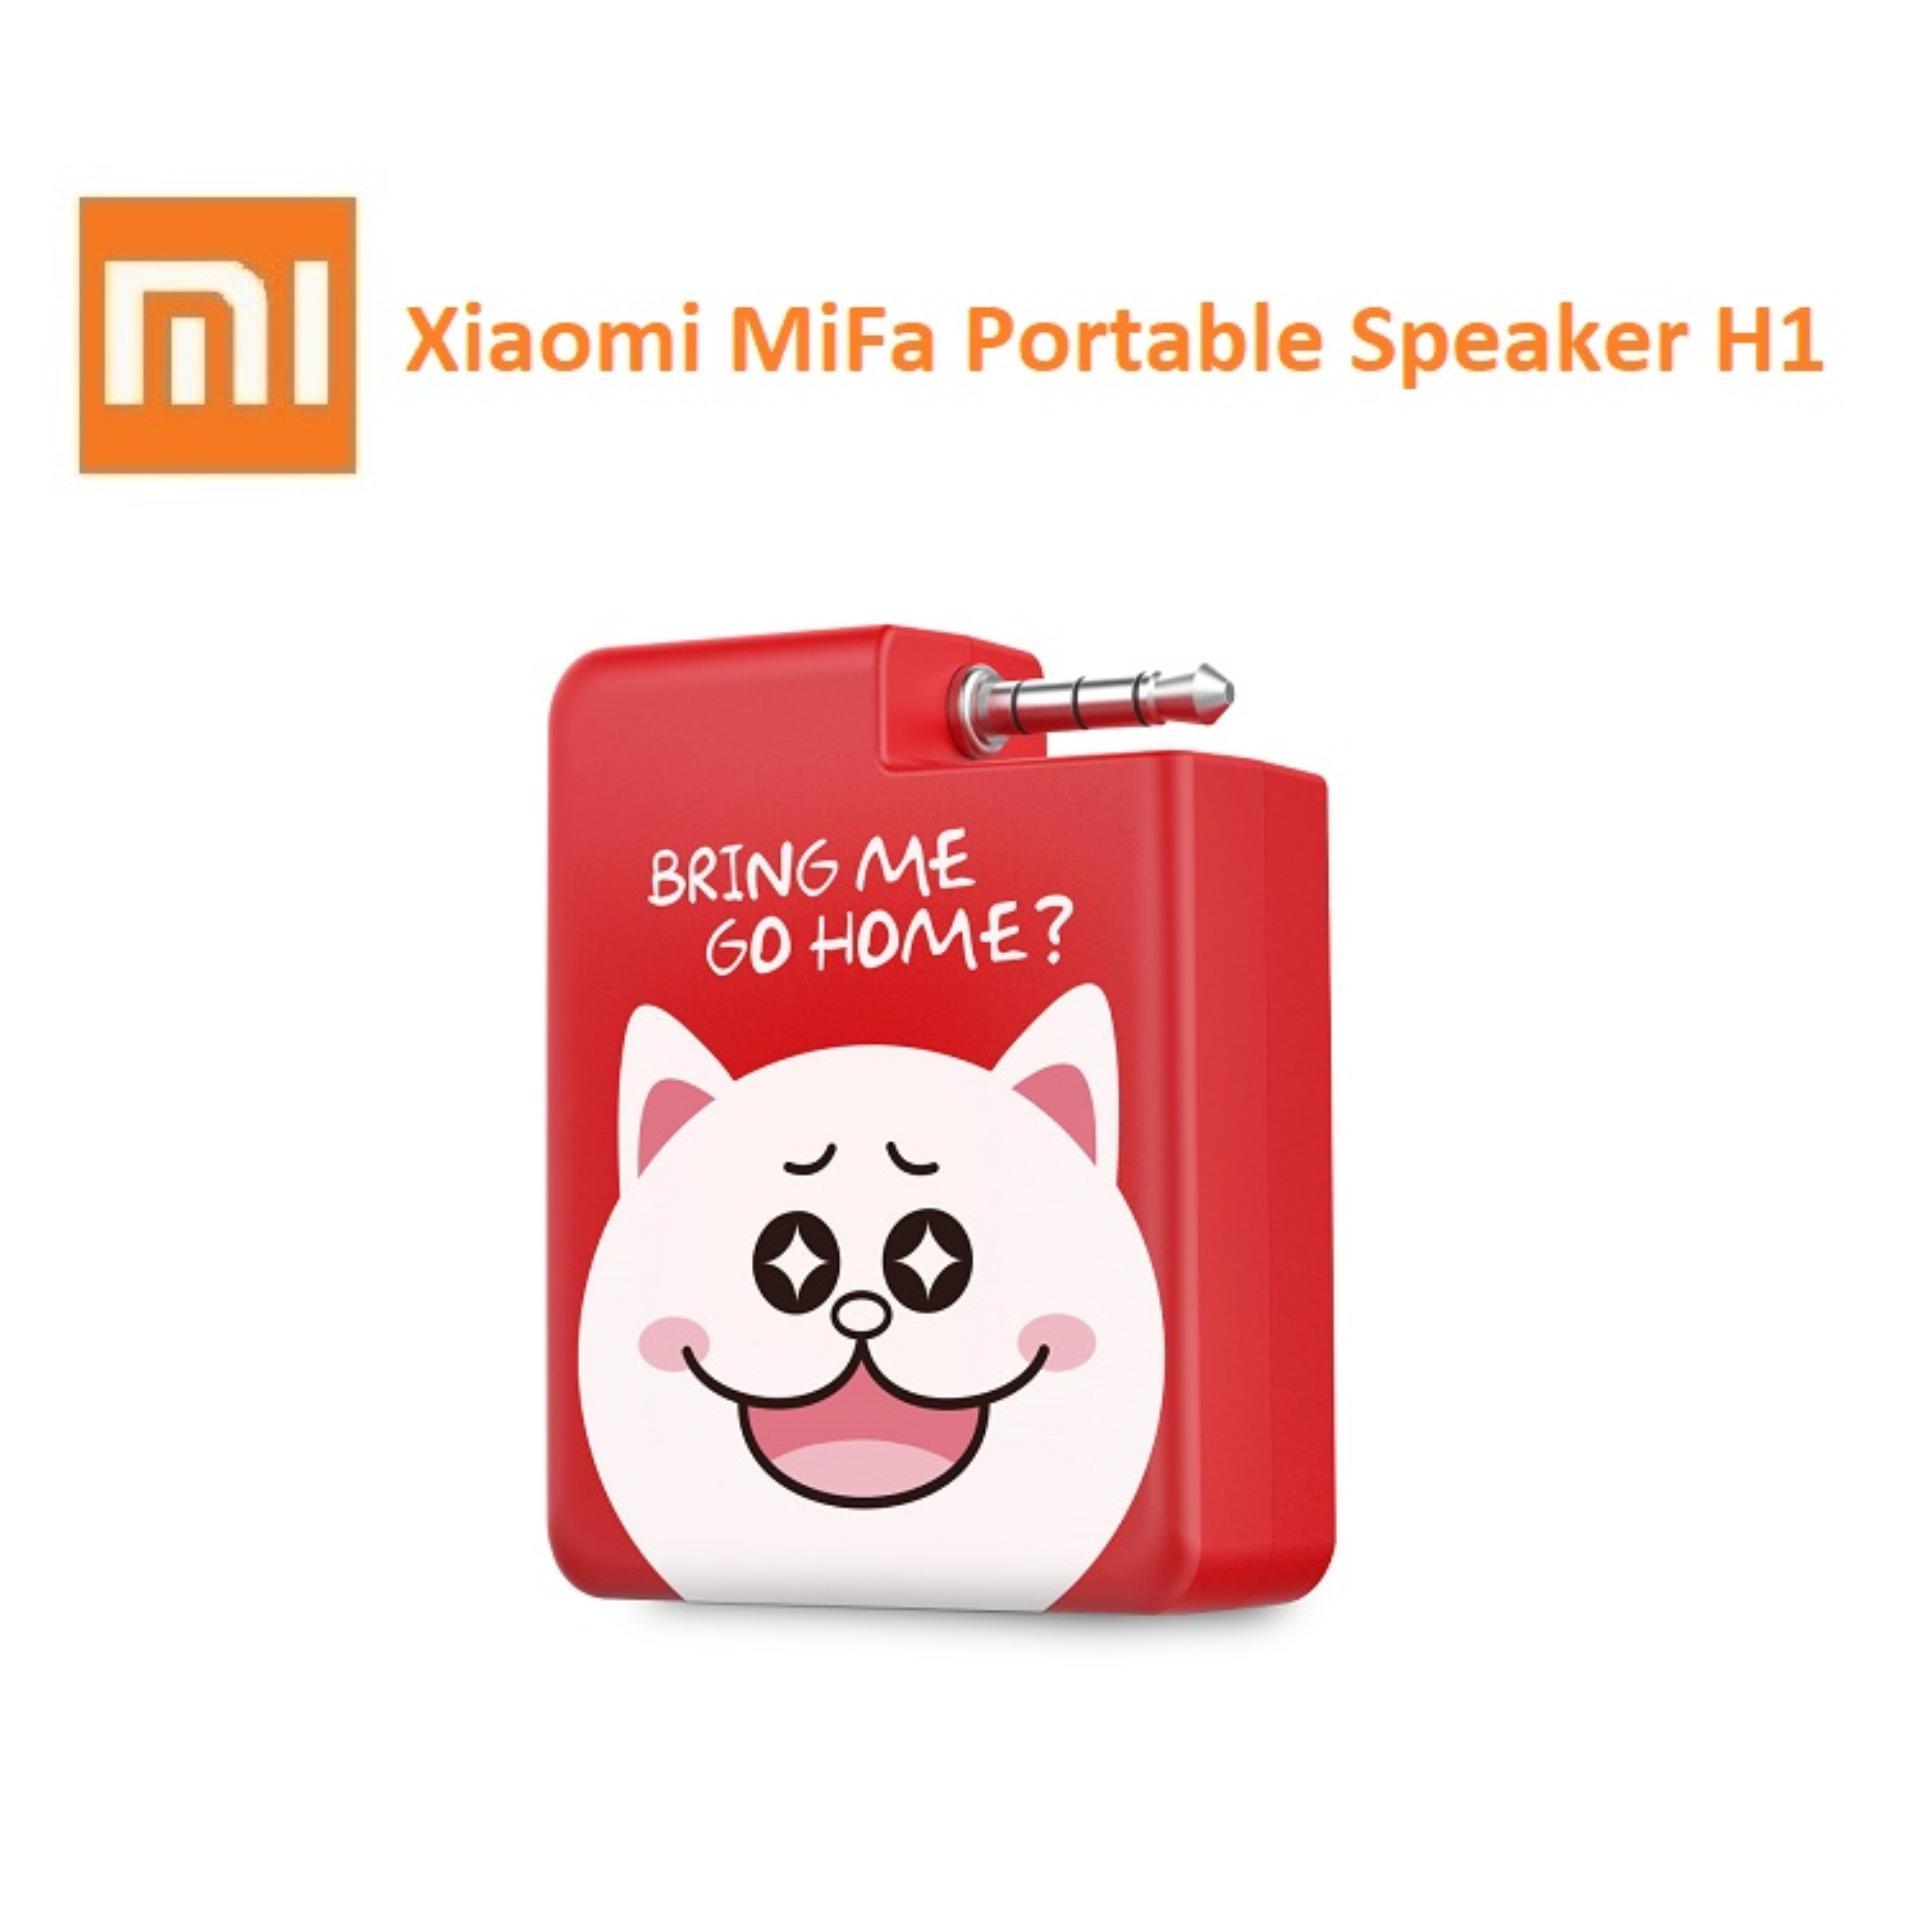 Toko Xiaomi Mifa H1 Portable Speaker Stereo Mini 3 5Mm Audio Plug N Play Merah Termurah Dki Jakarta